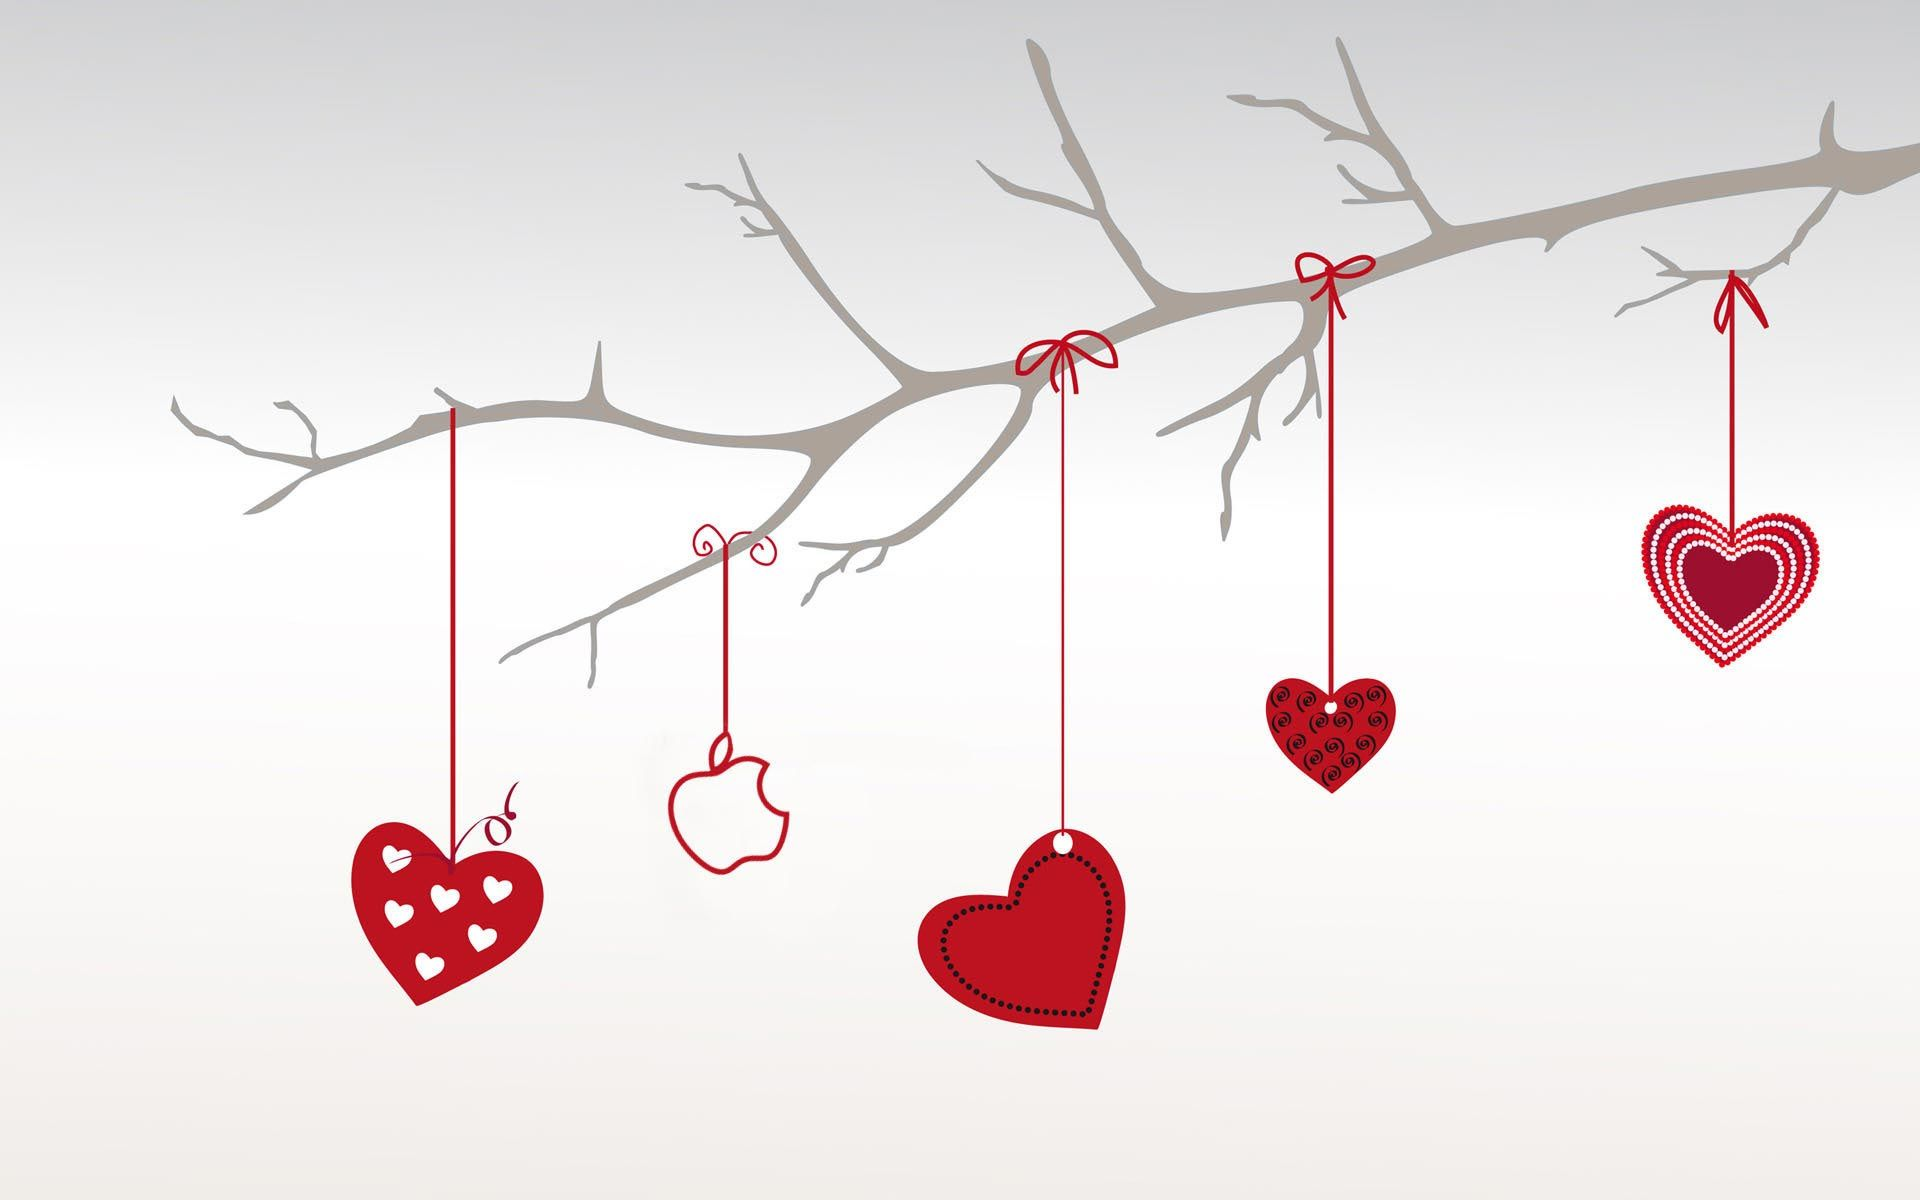 Wallpaper For Desktop Valentine